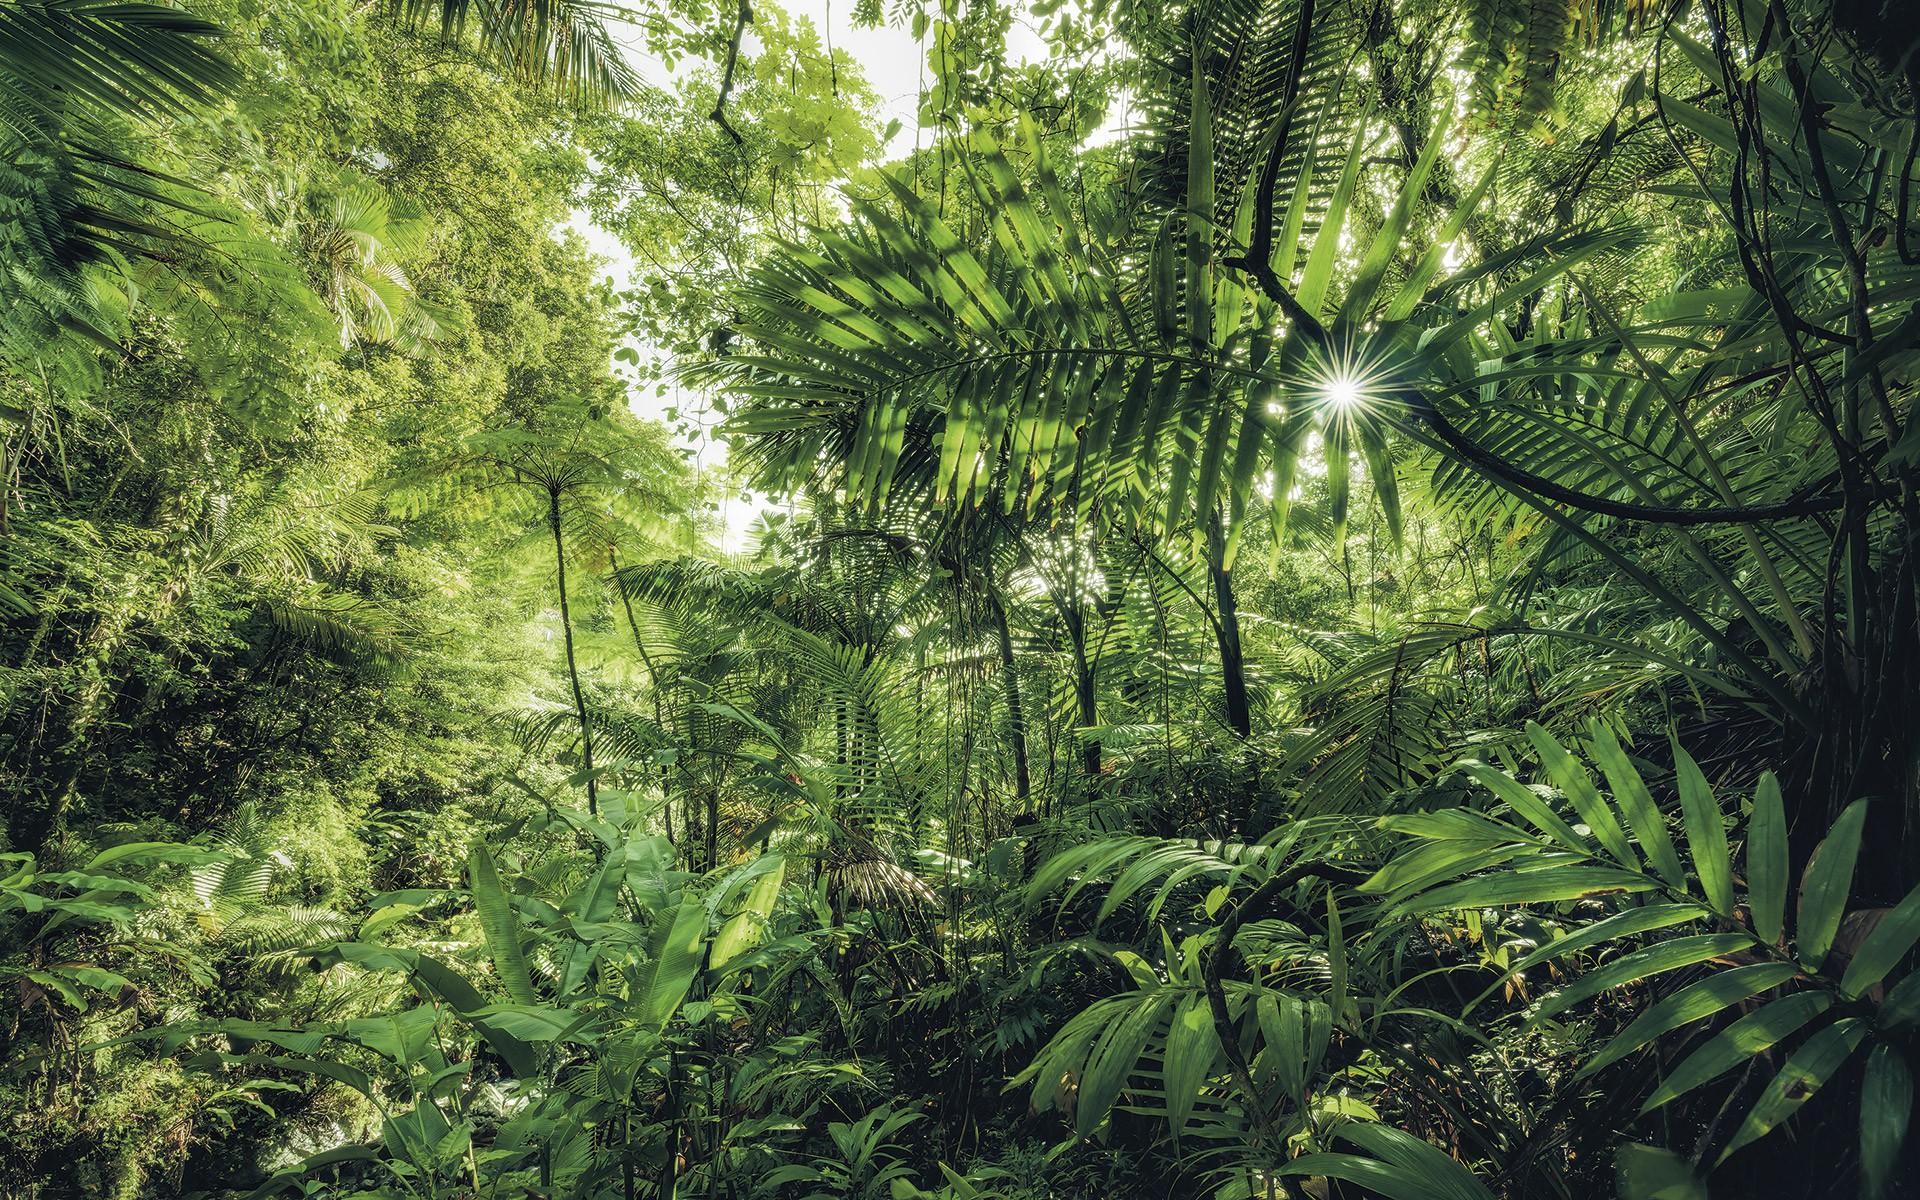 Dél-Amerikai buja dzsungel fali poszter